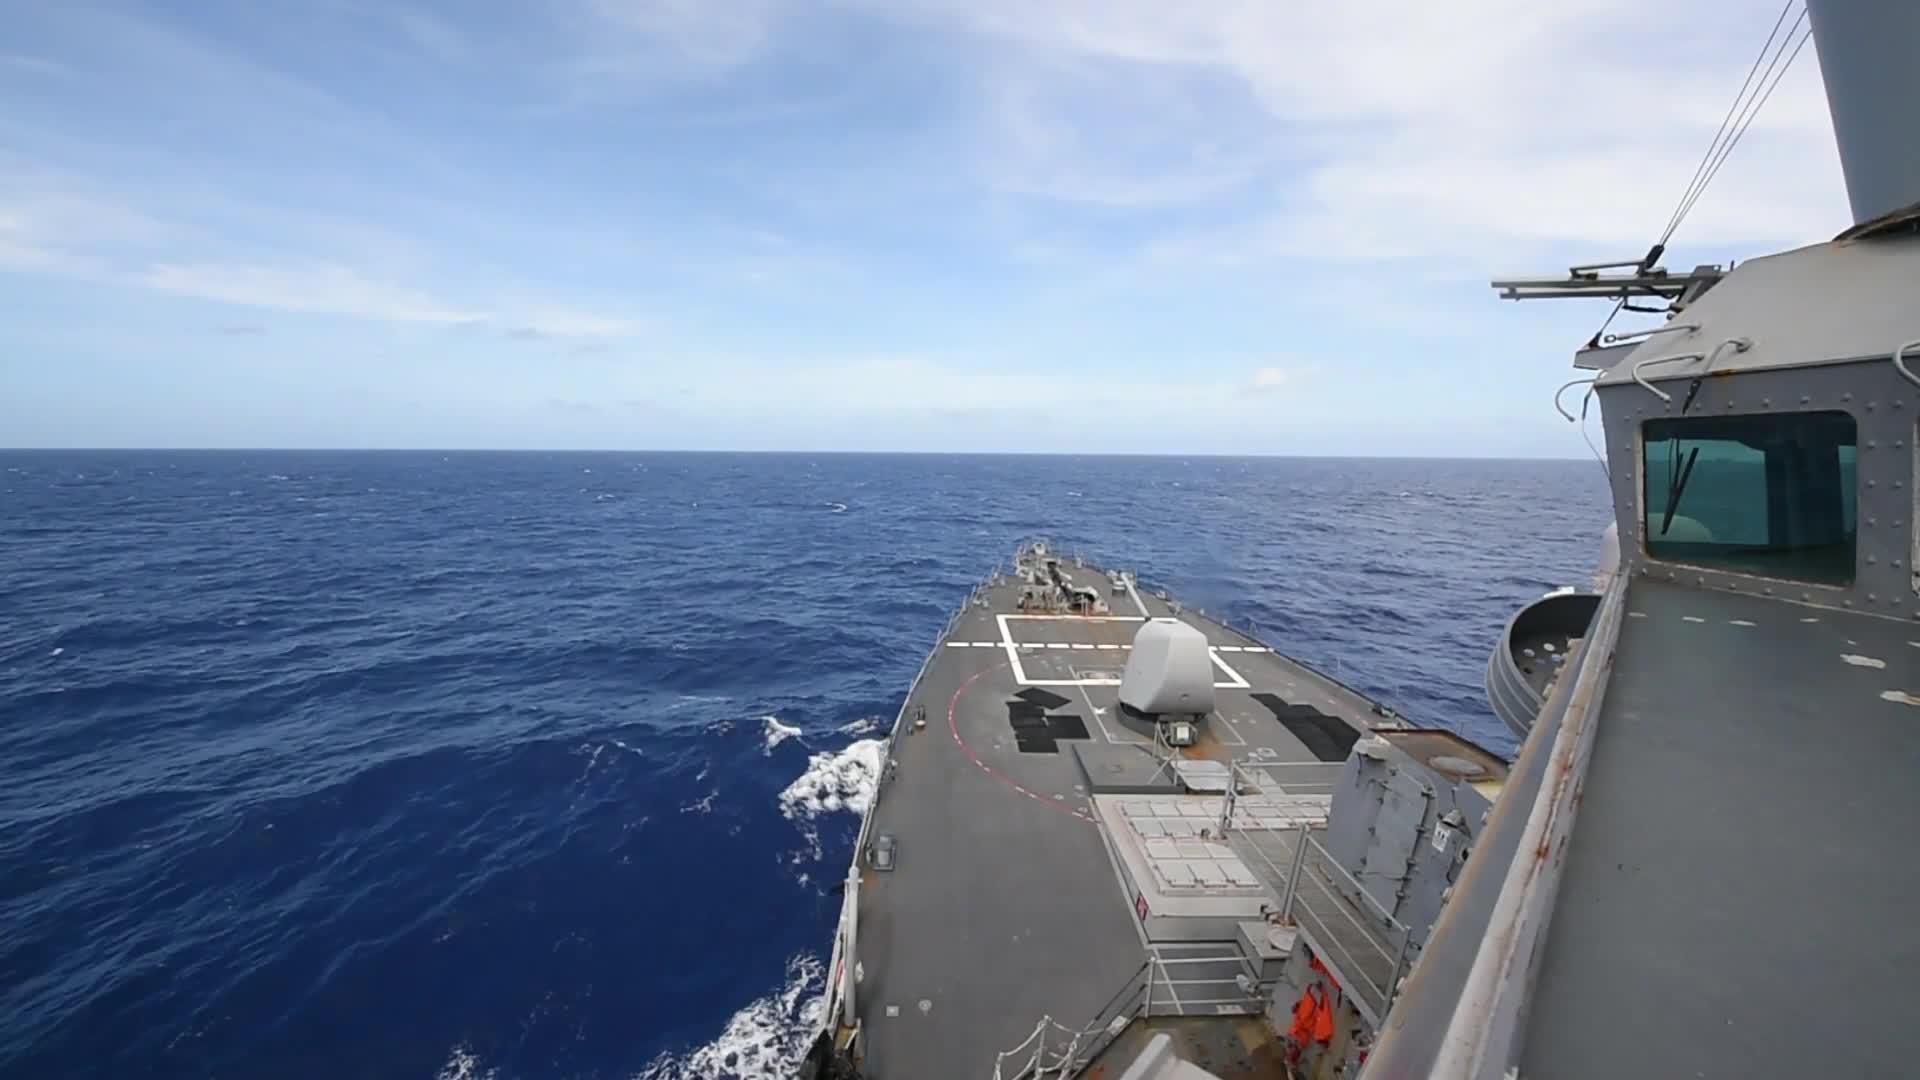 U.S. Navy, ddg, ddg 69, destroyer, exercise, missile, philippine sea, usnavy, uss milius, weapons, USS Millius (DDG 69) Weapons Exercise in the Philippine Sea GIFs